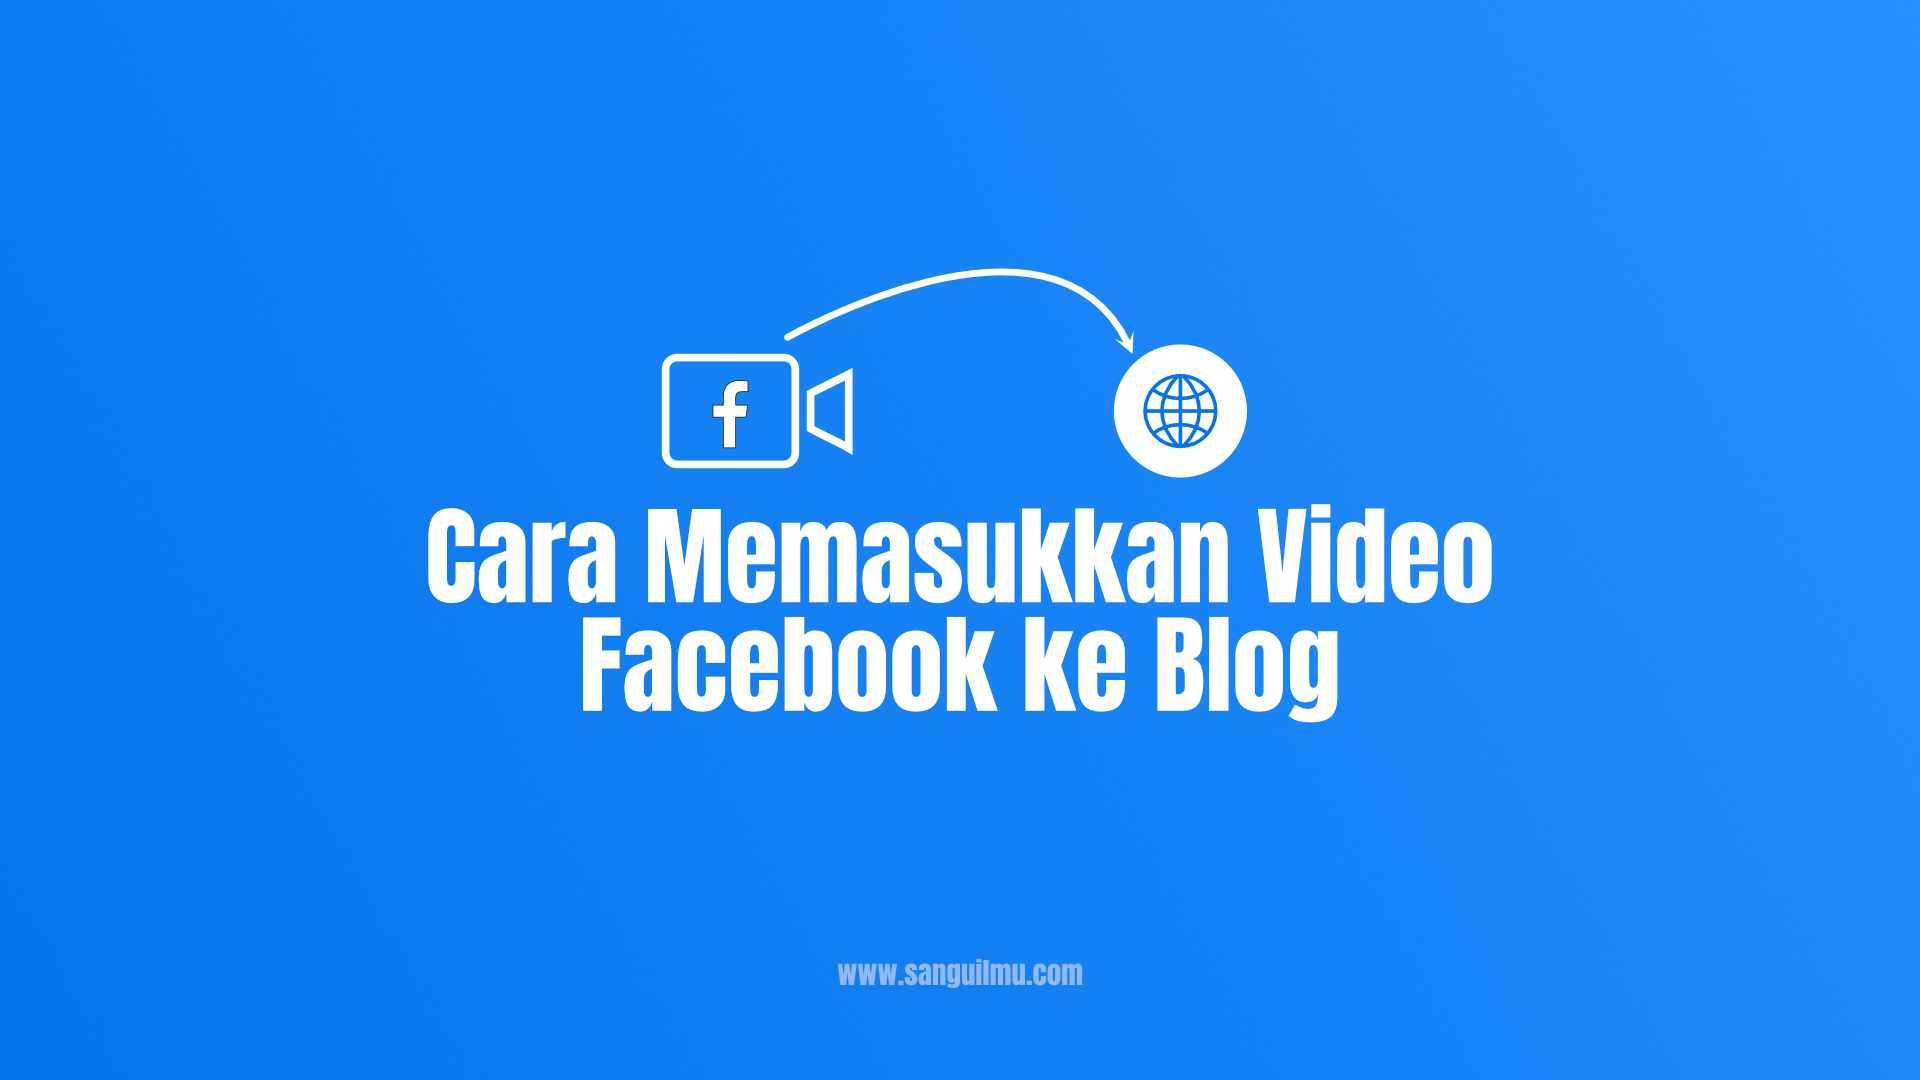 Cara Memasukkan Video Facebook ke Blog |